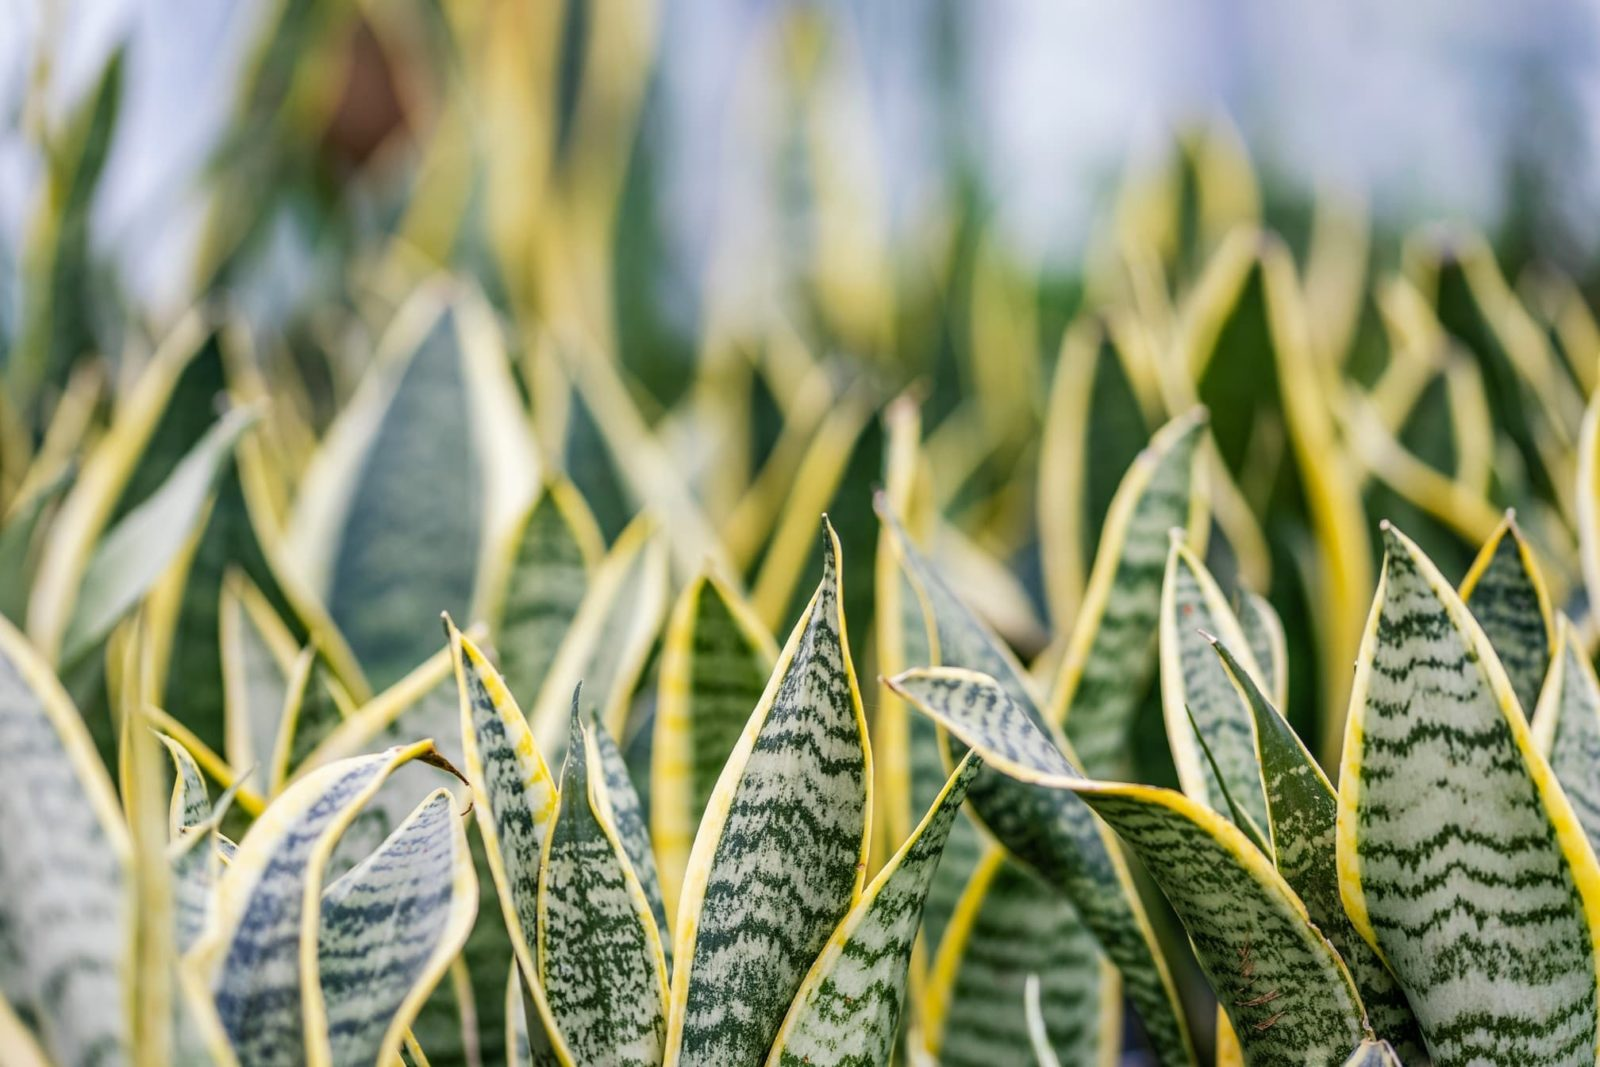 Dracaena trifasciata plants